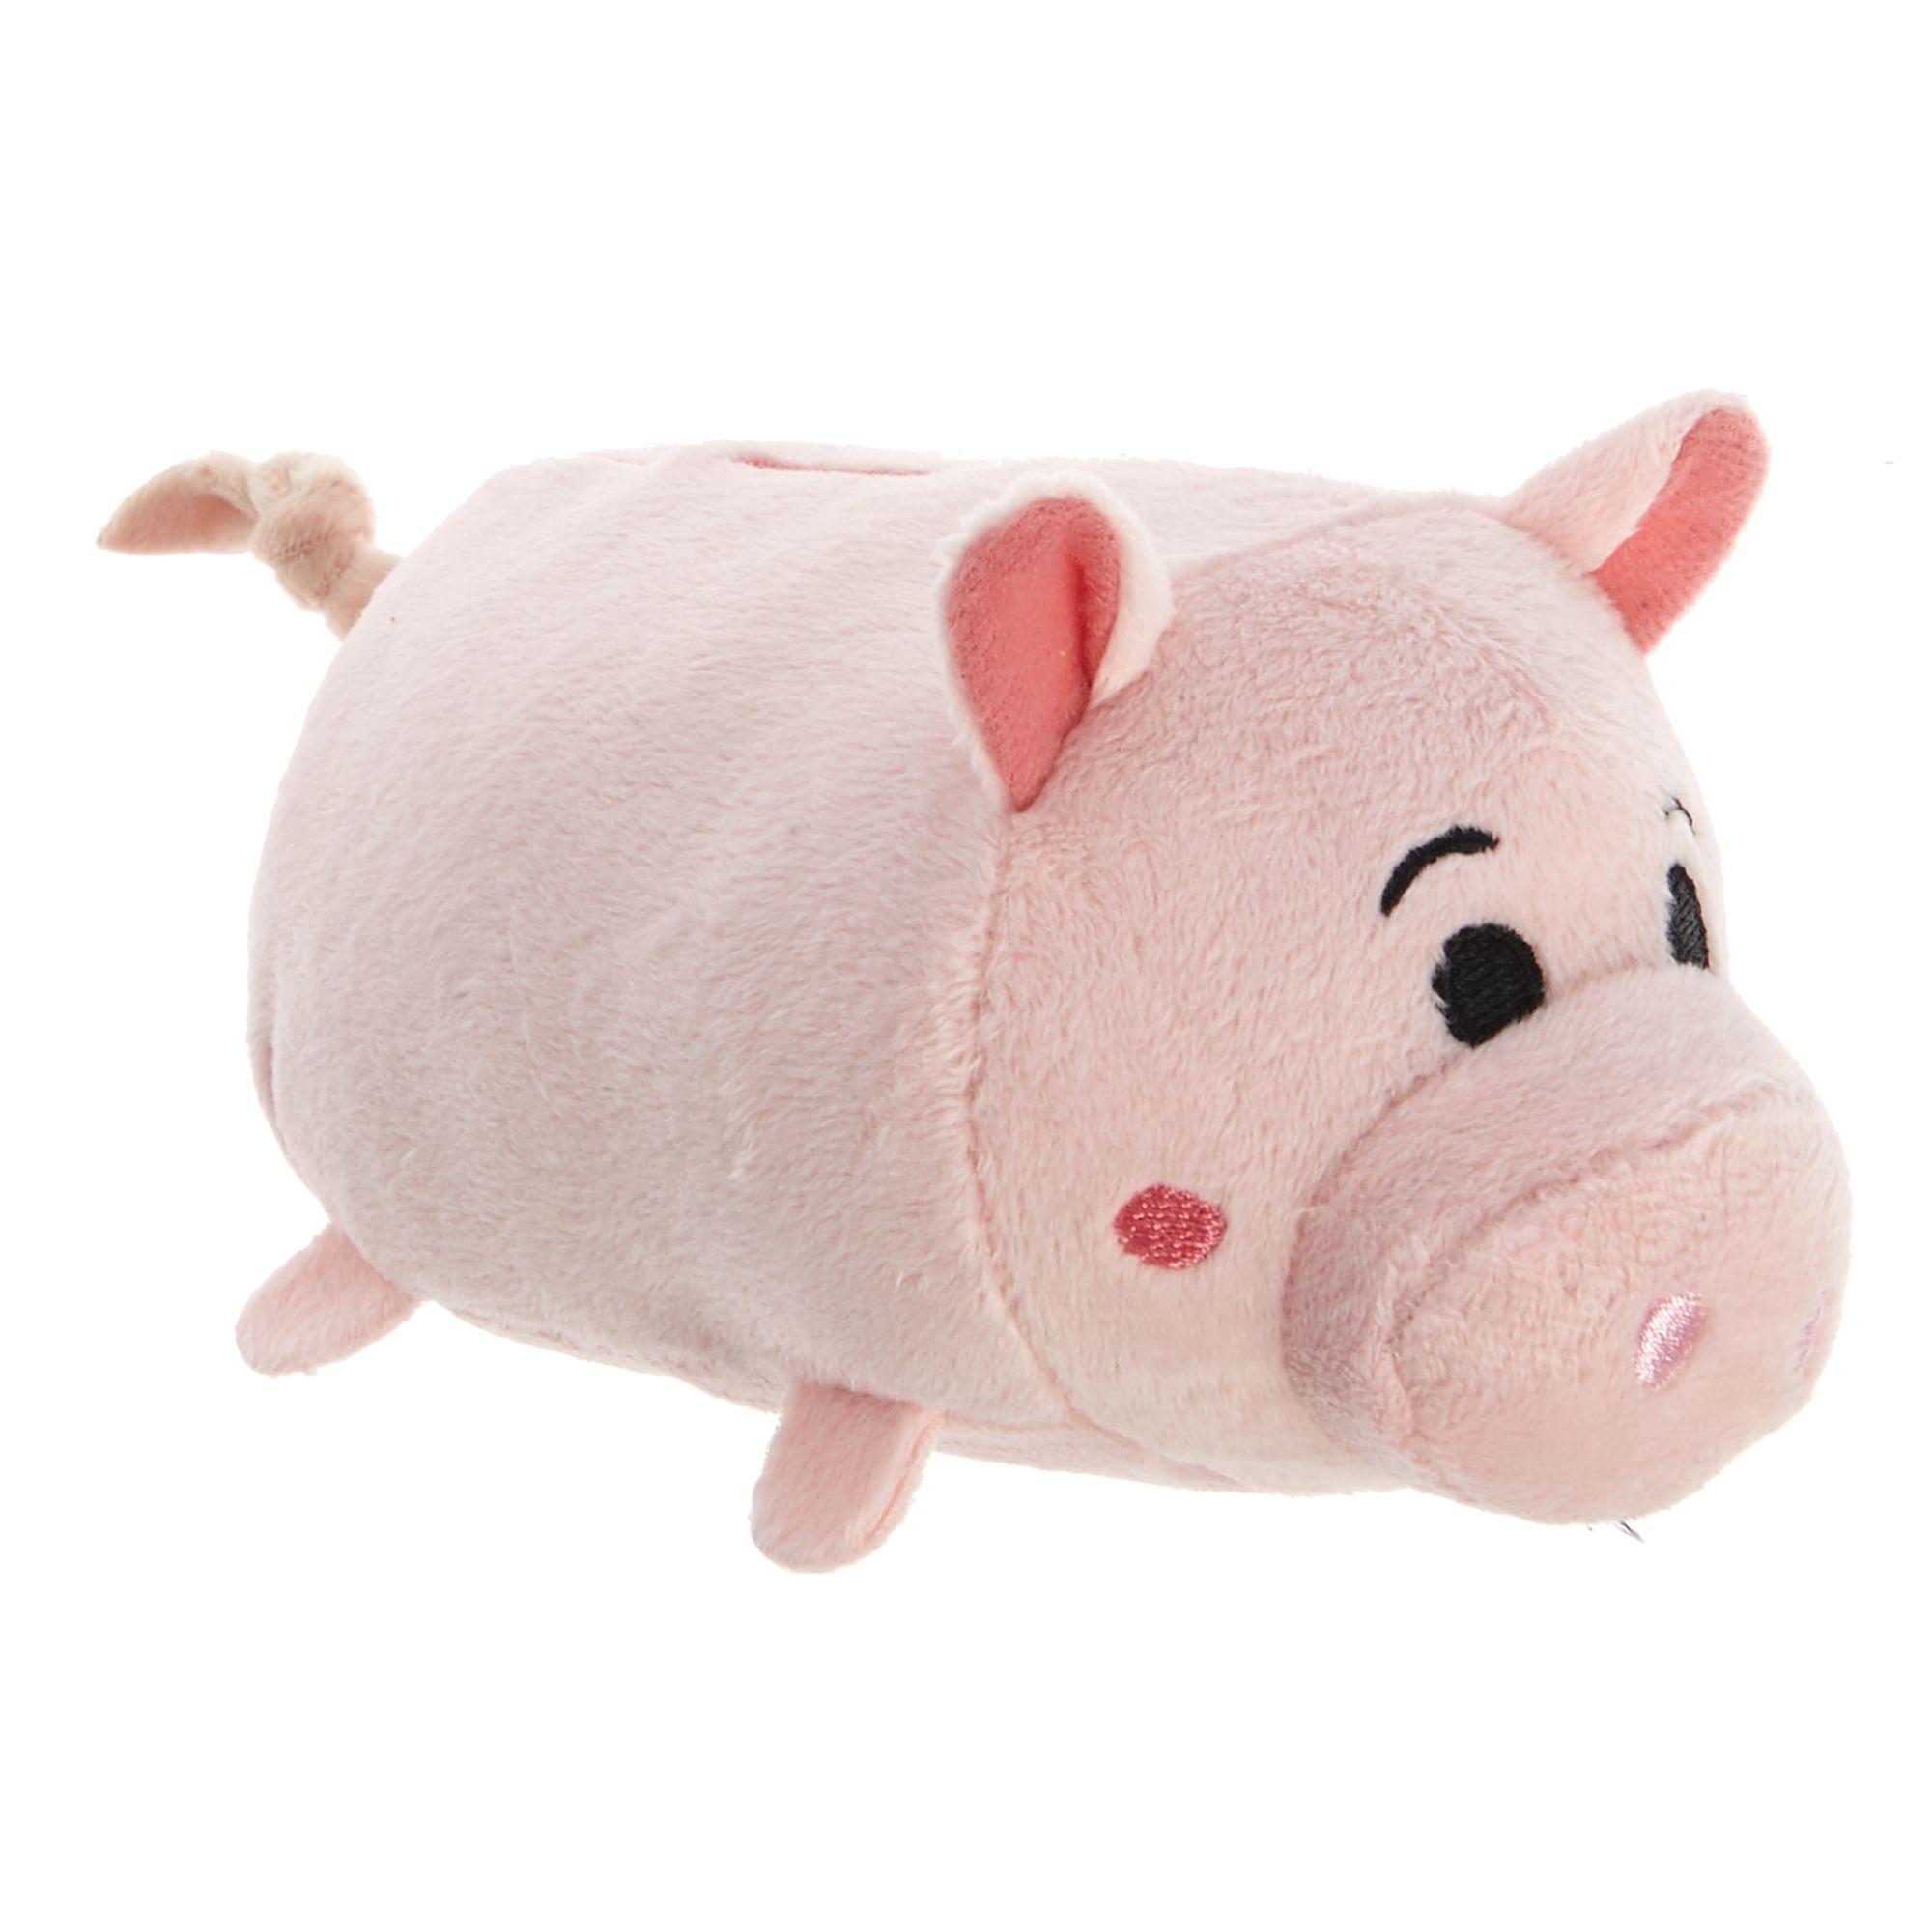 "Disney Hamm ""Tsum Tsum"" Dog Toy - Plush, Squeaker size: Medium 5274252"